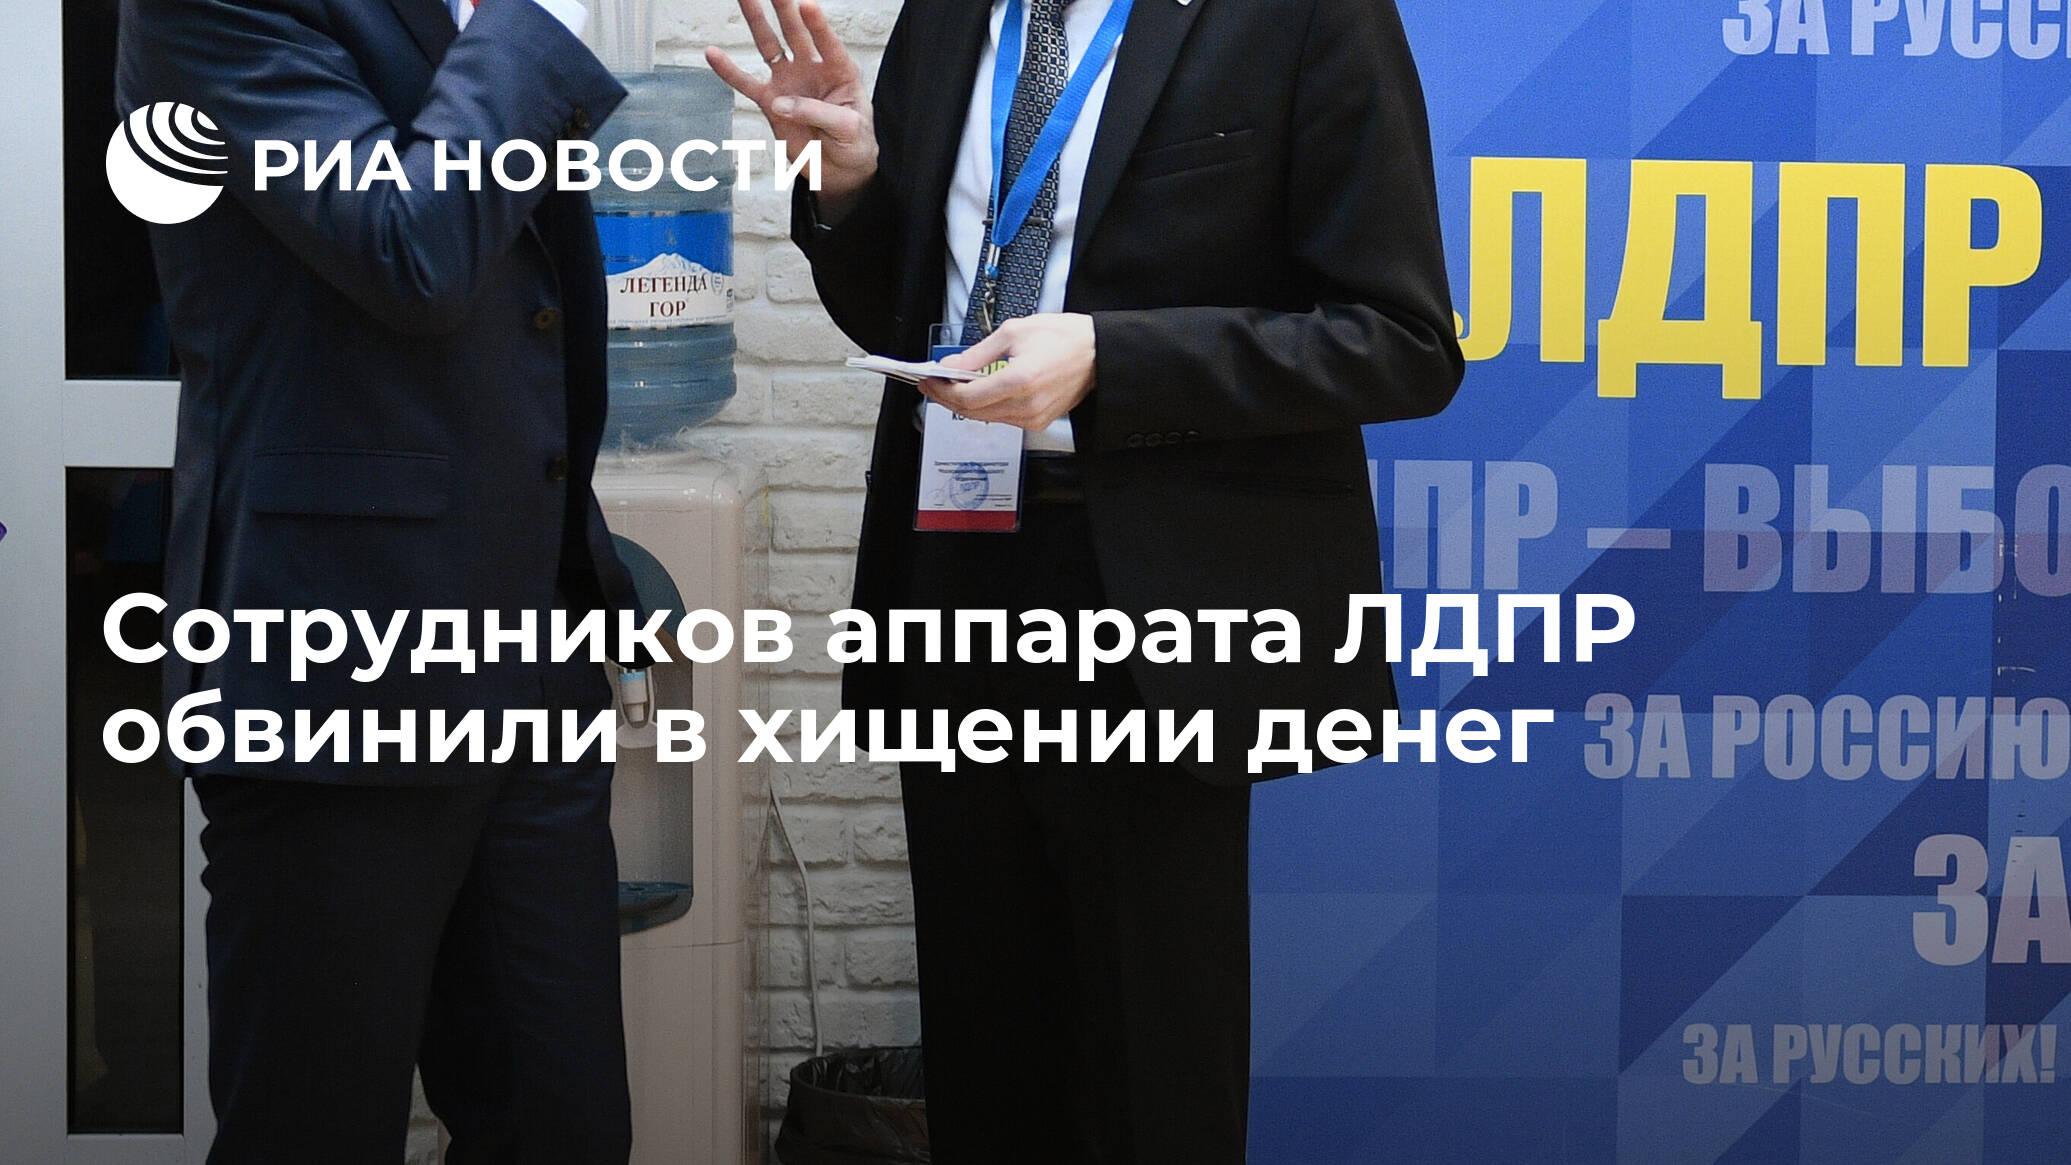 Сотрудников аппарата ЛДПР обвинили в хищении денег